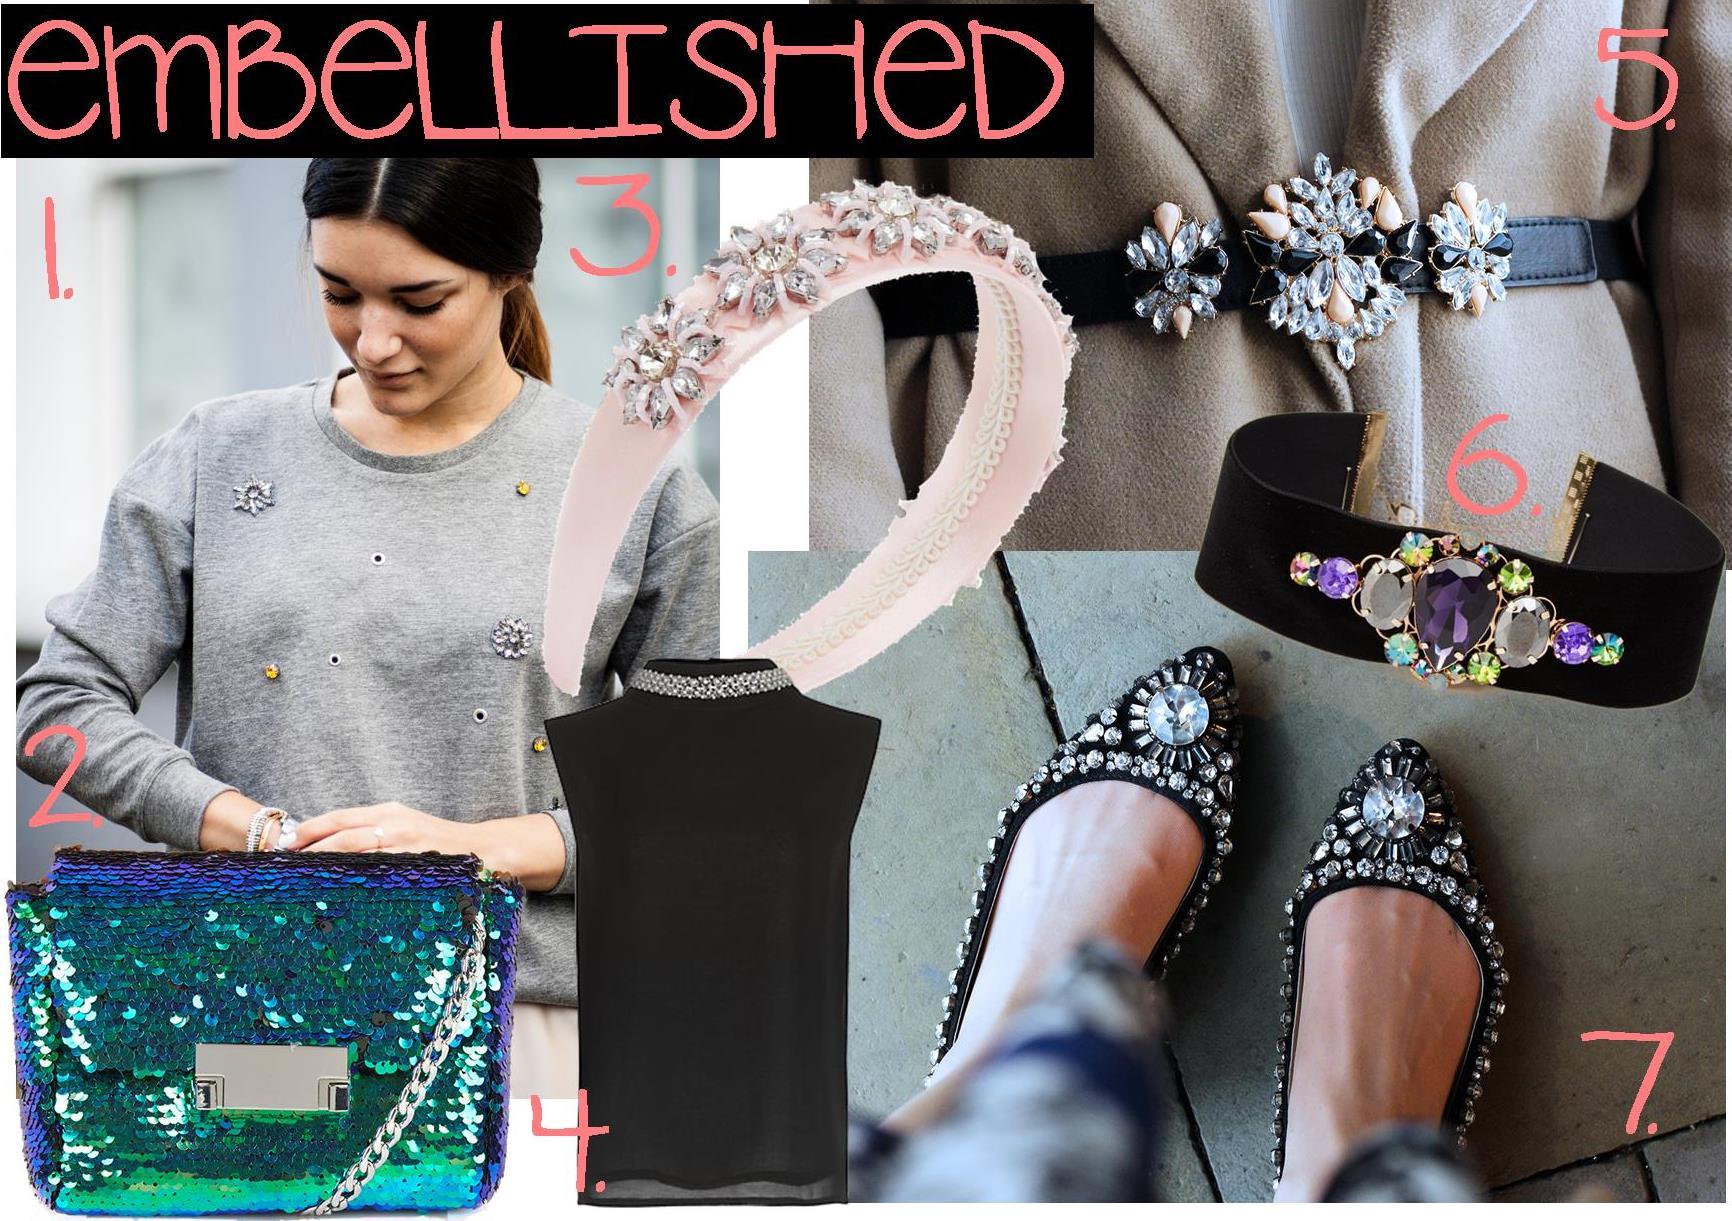 Blog Girls Embellished AW14